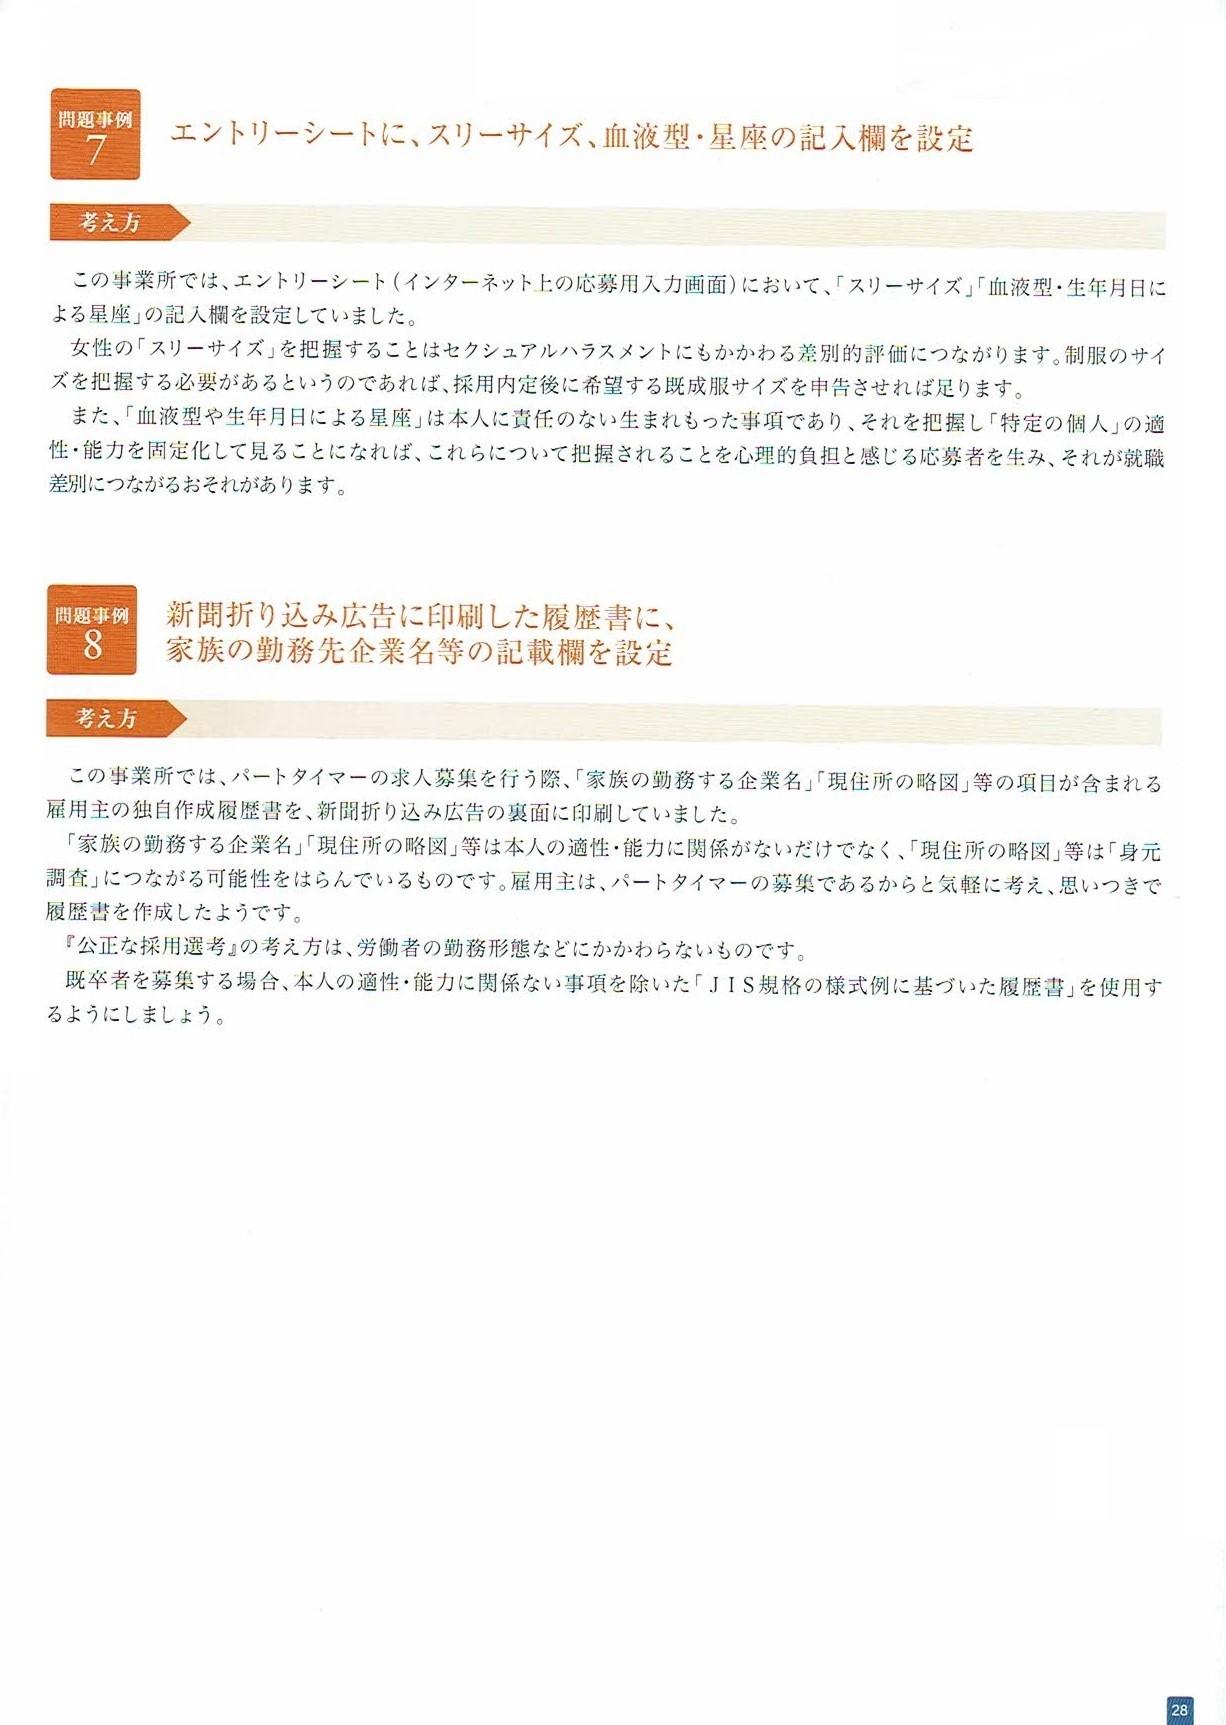 CCF_000038.jpg